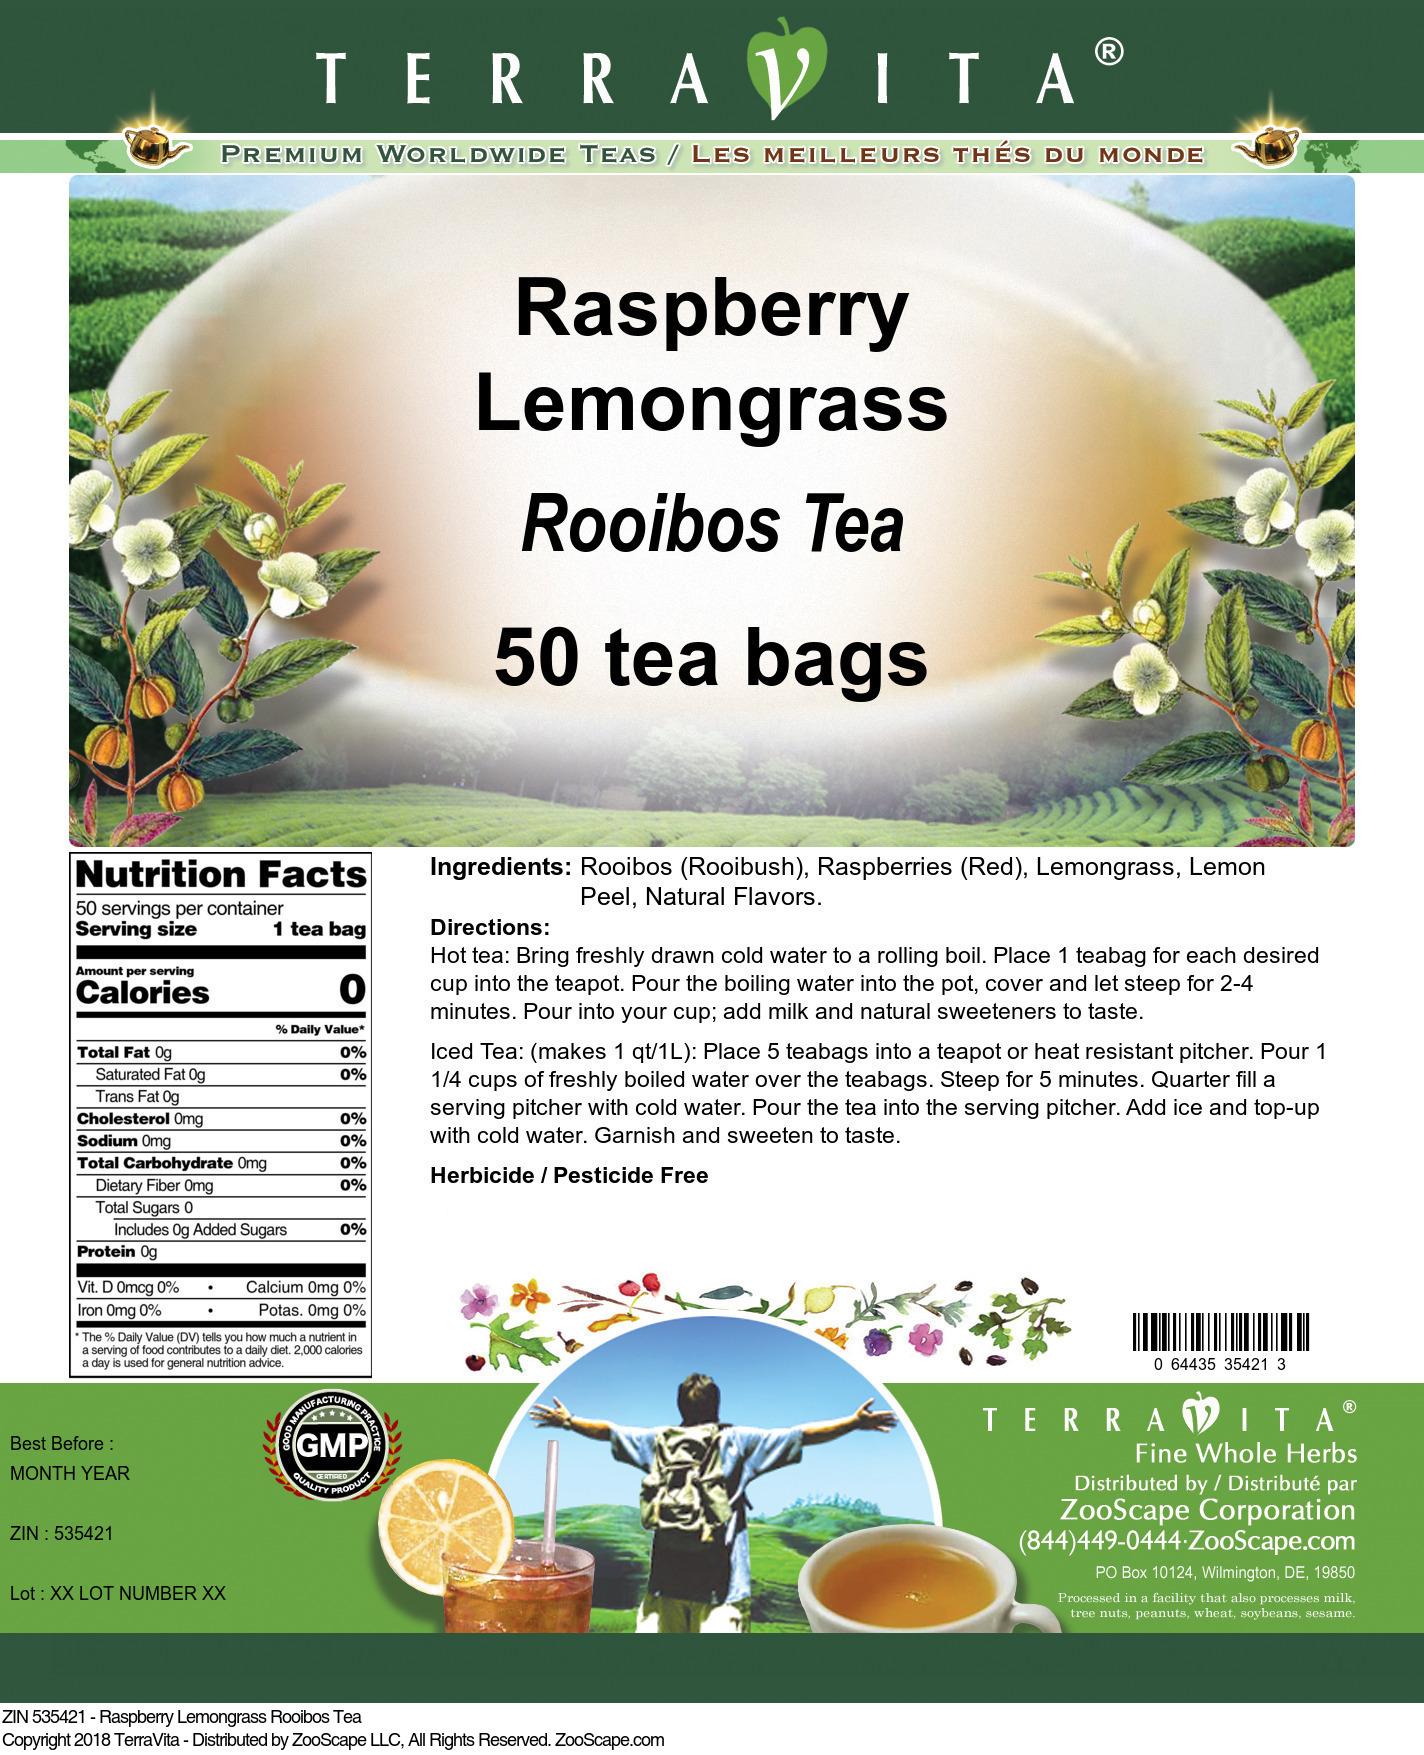 Raspberry Lemongrass Rooibos Tea